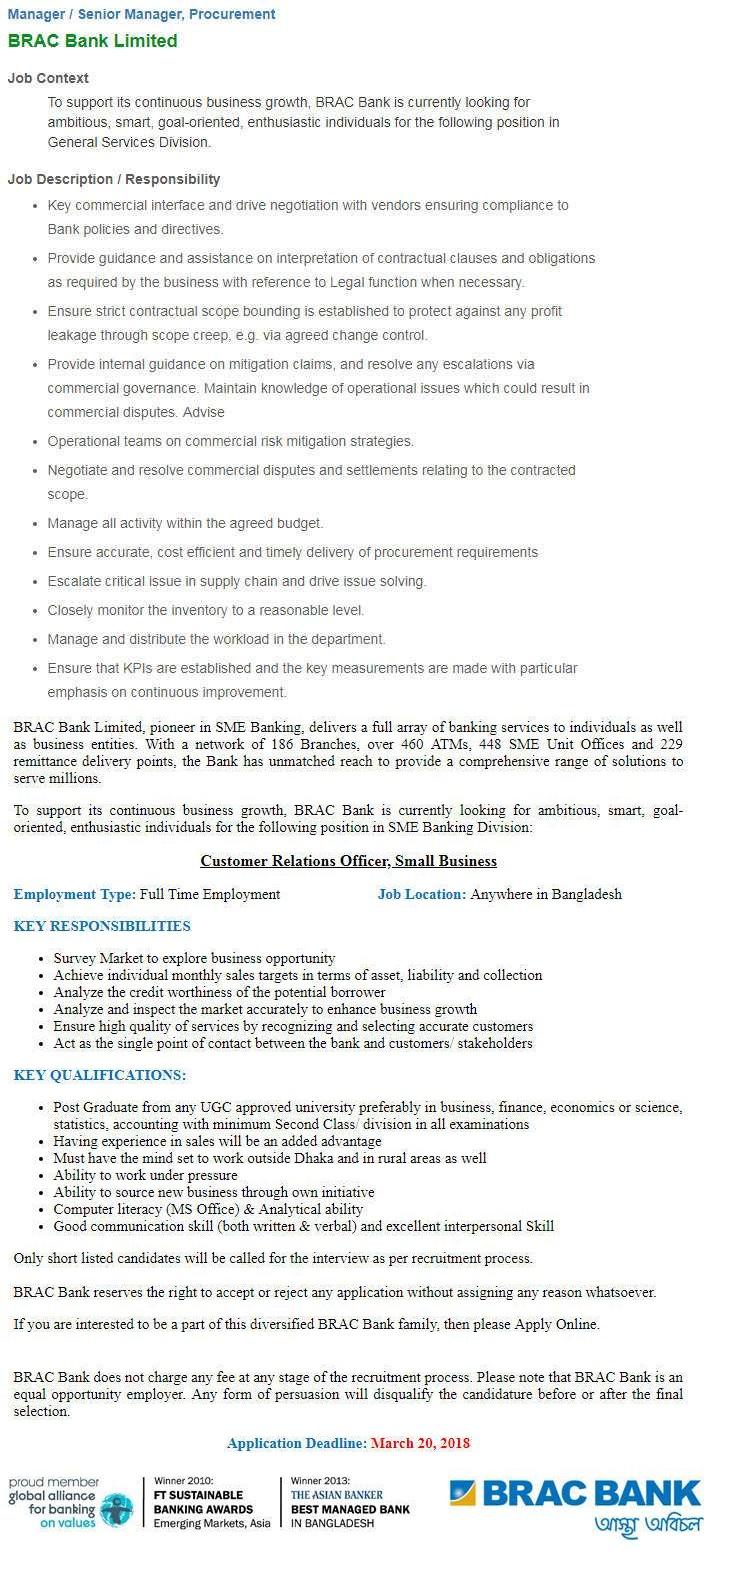 BRAC Bank Job Circular In 2018